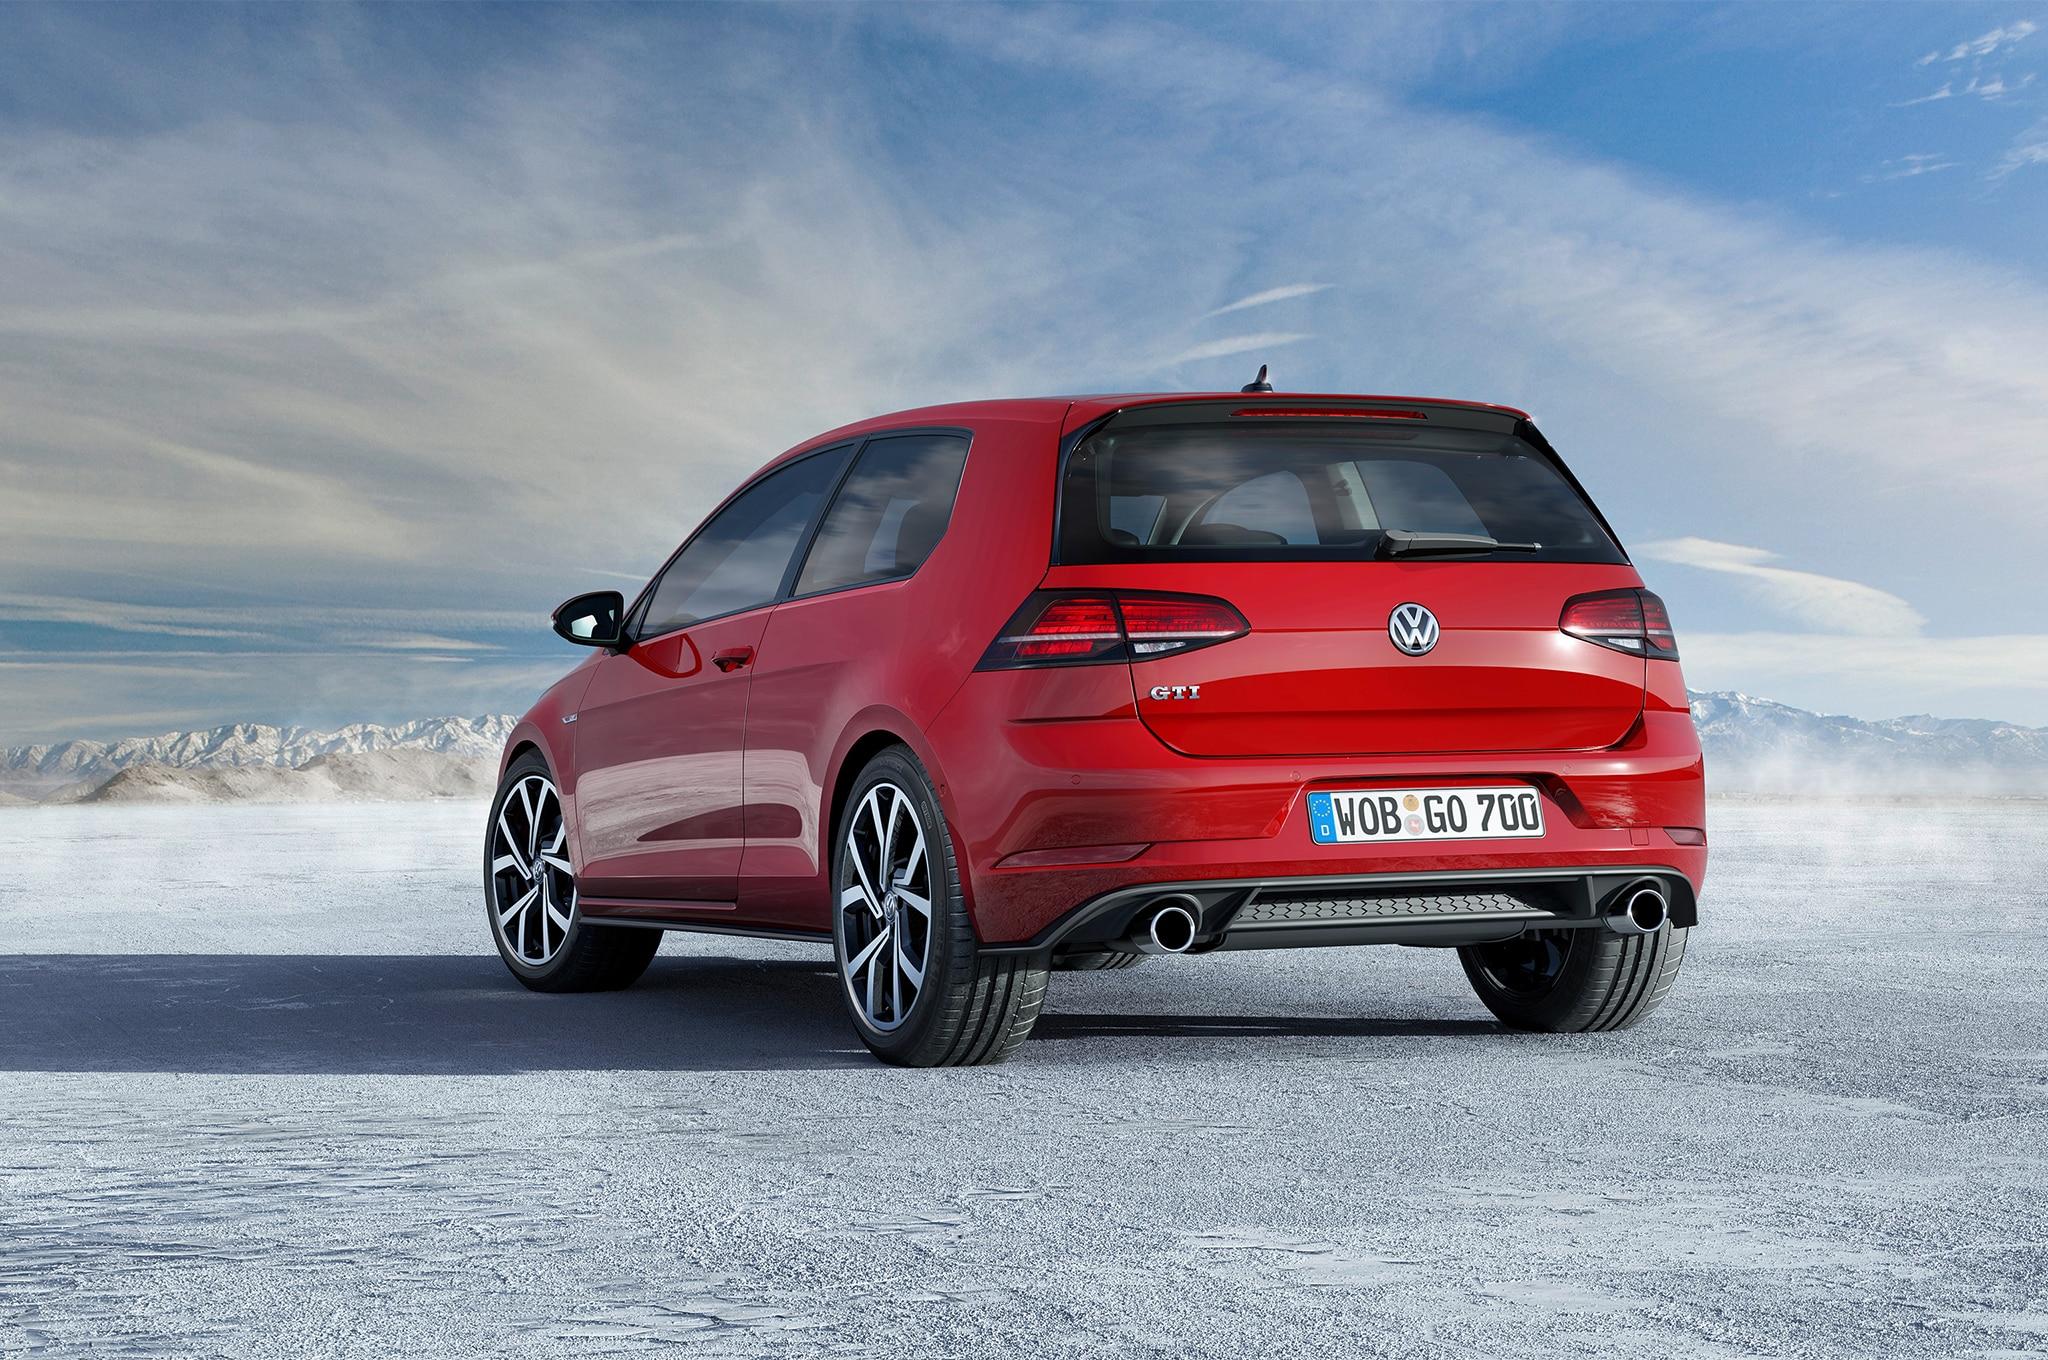 gti golf volkswagen spec european rear facelift vii speed tsi bmt hp drive weight magazine st lb